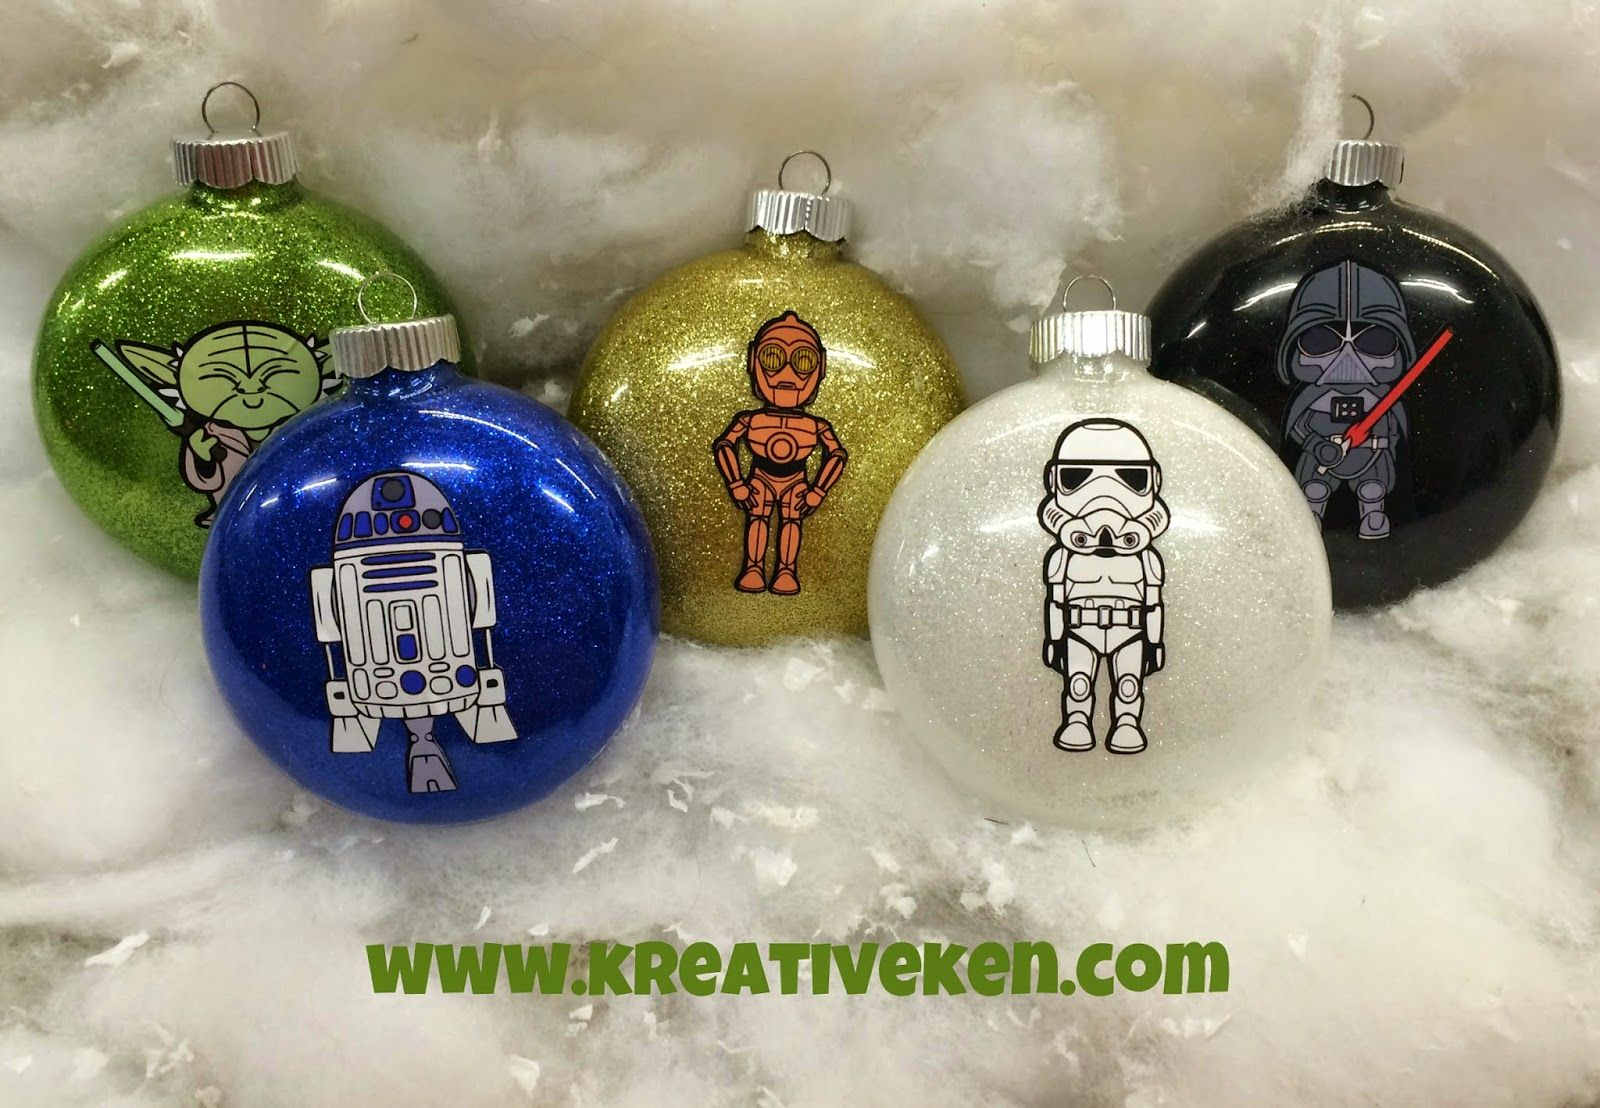 Ken S Kreations Star Wars Ornaments Star Wars Christmas Ornaments Star Wars Christmas Decorations Star Wars Christmas Tree